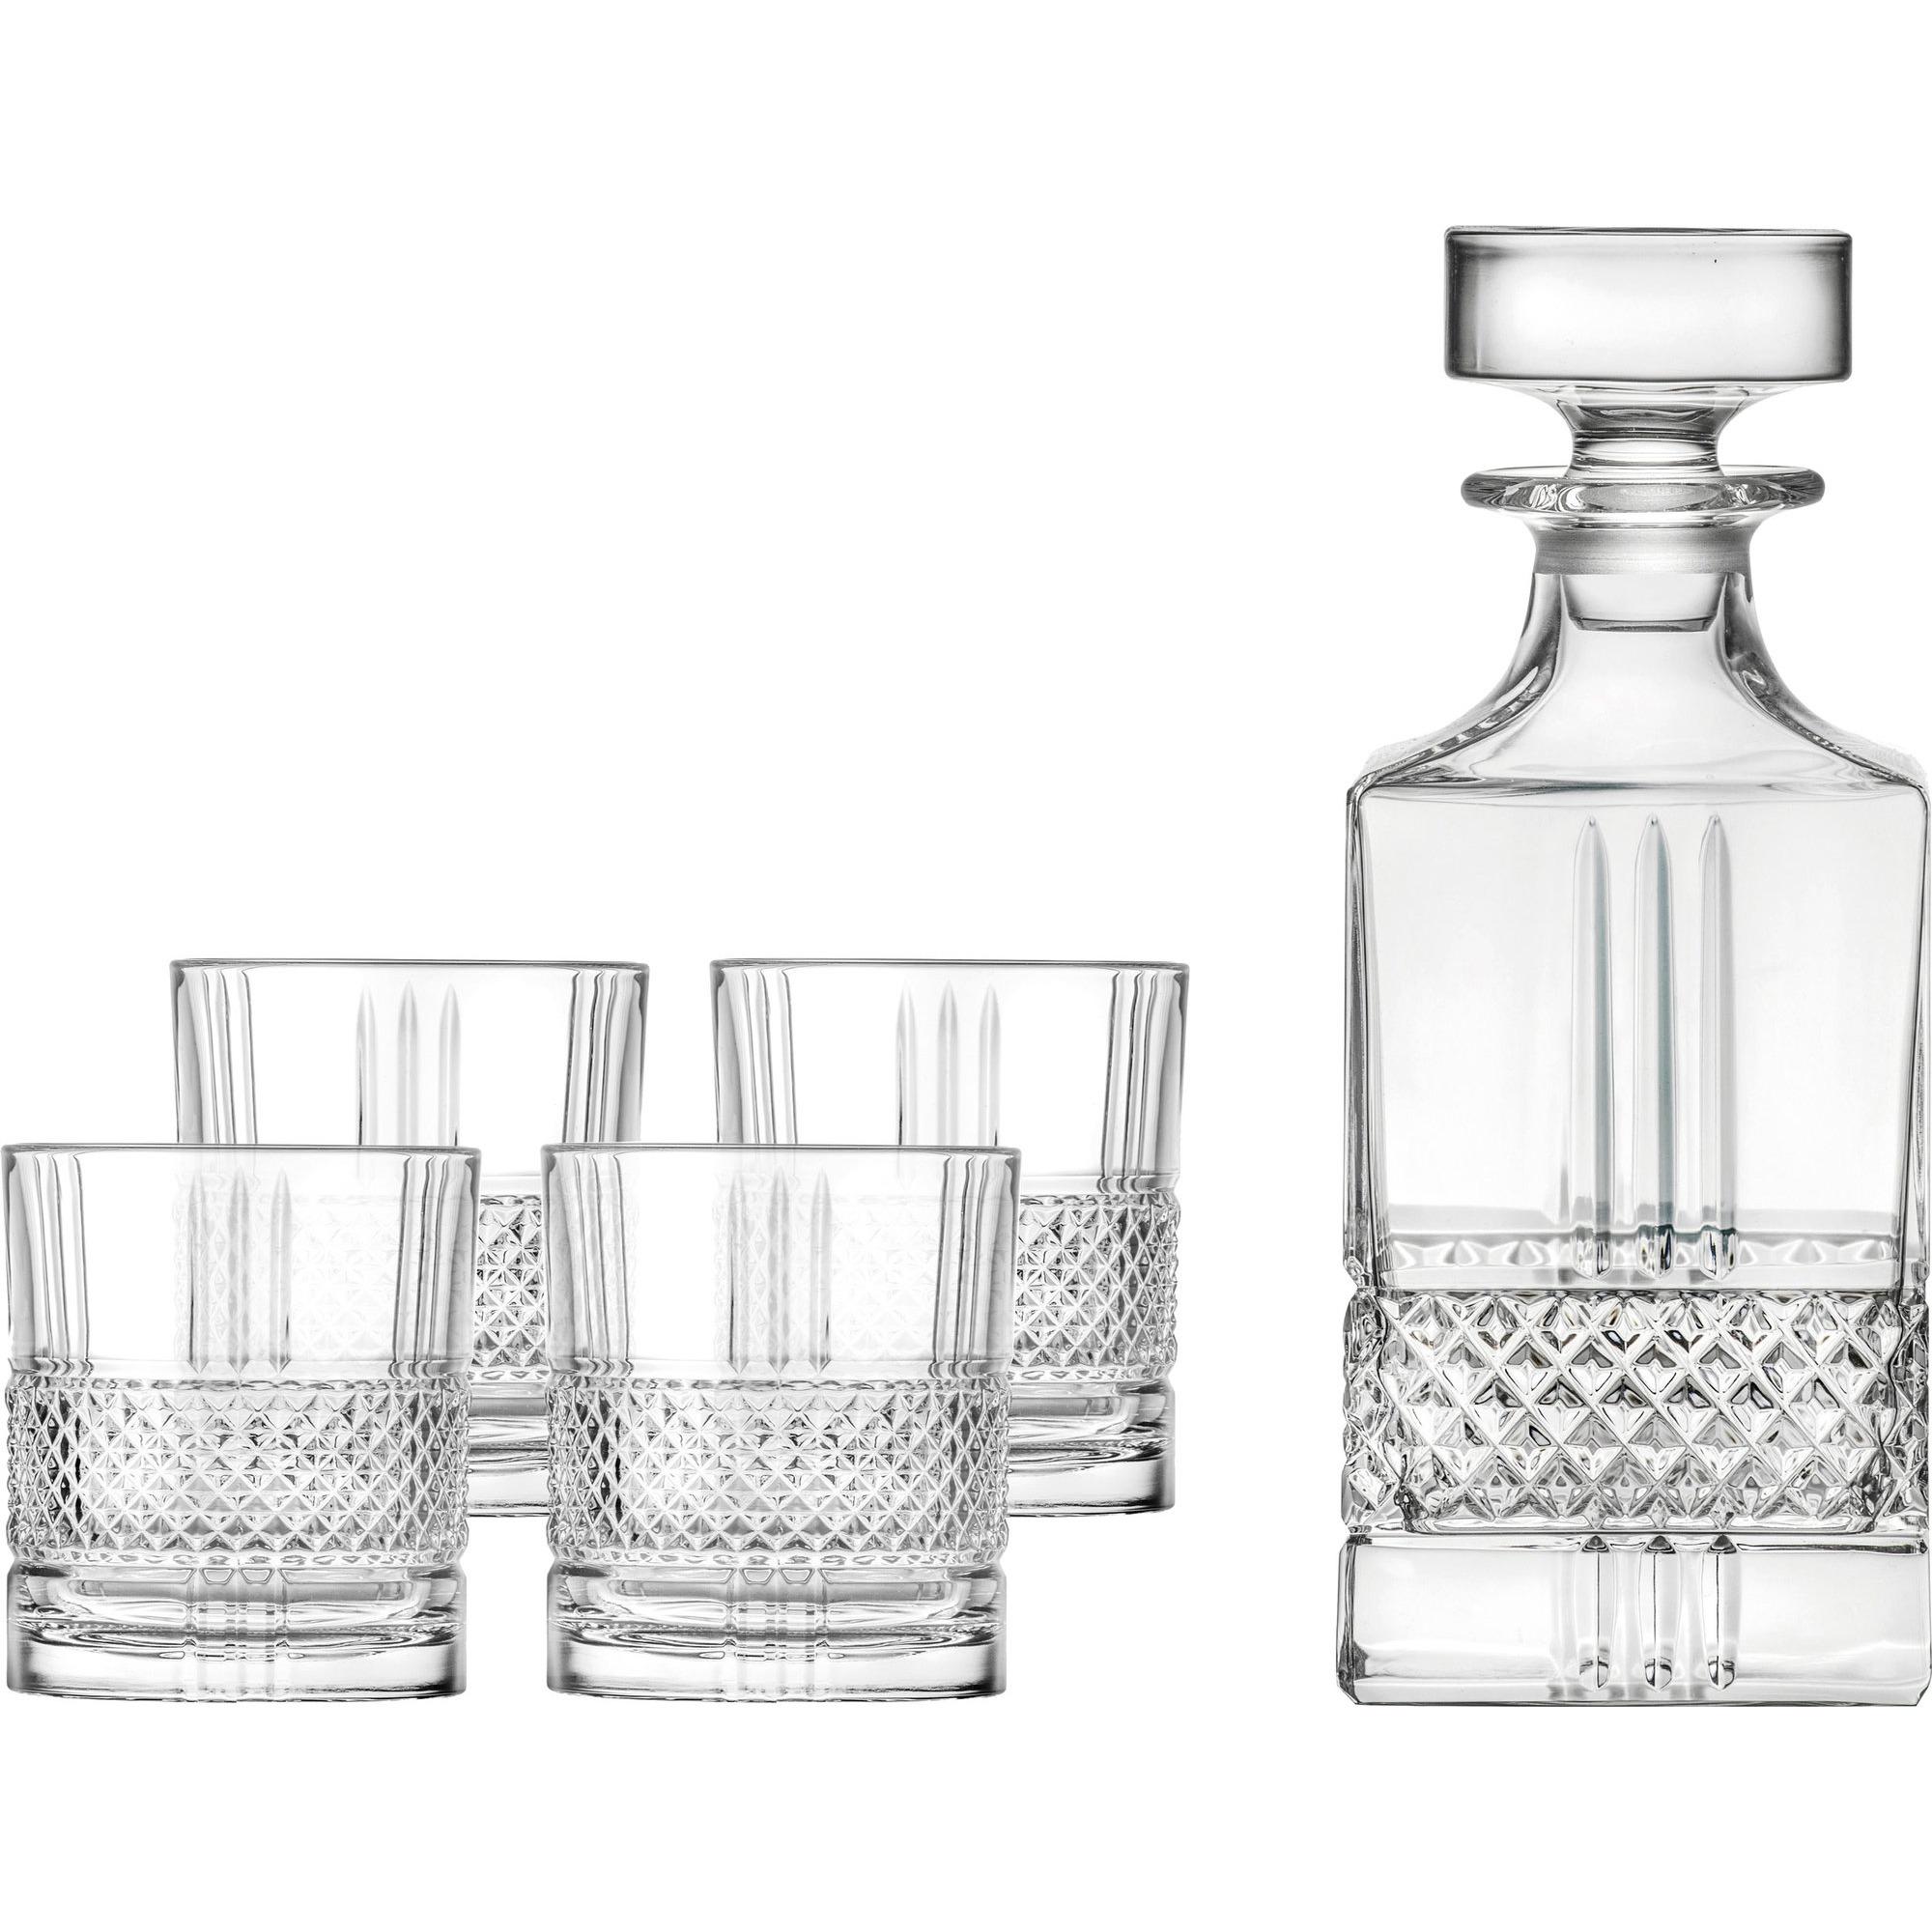 Lyngby Glas Brilliante Whiskyset 5 delar